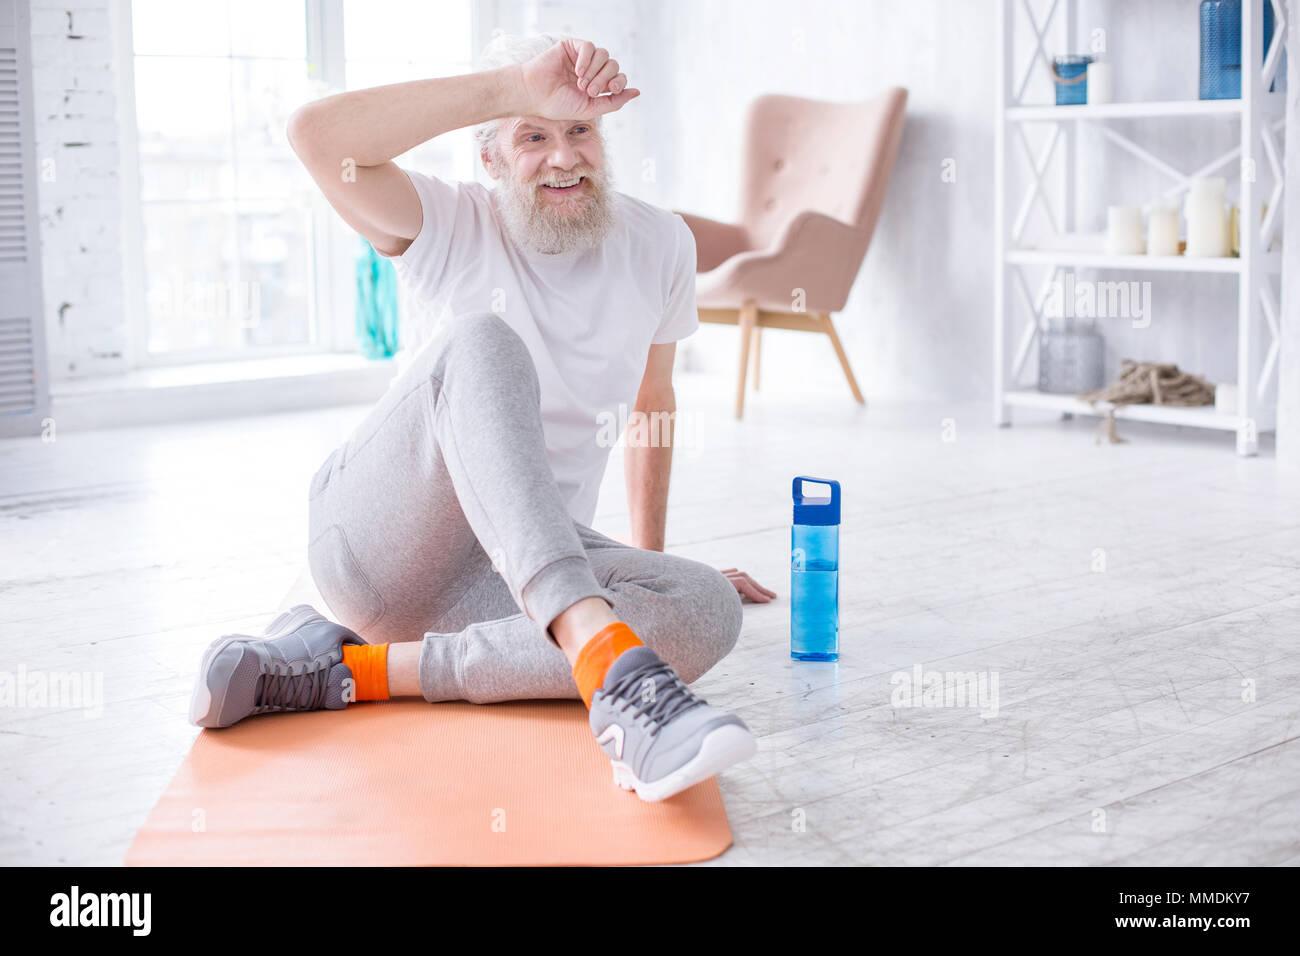 Charming senior man having rest after exercising - Stock Image